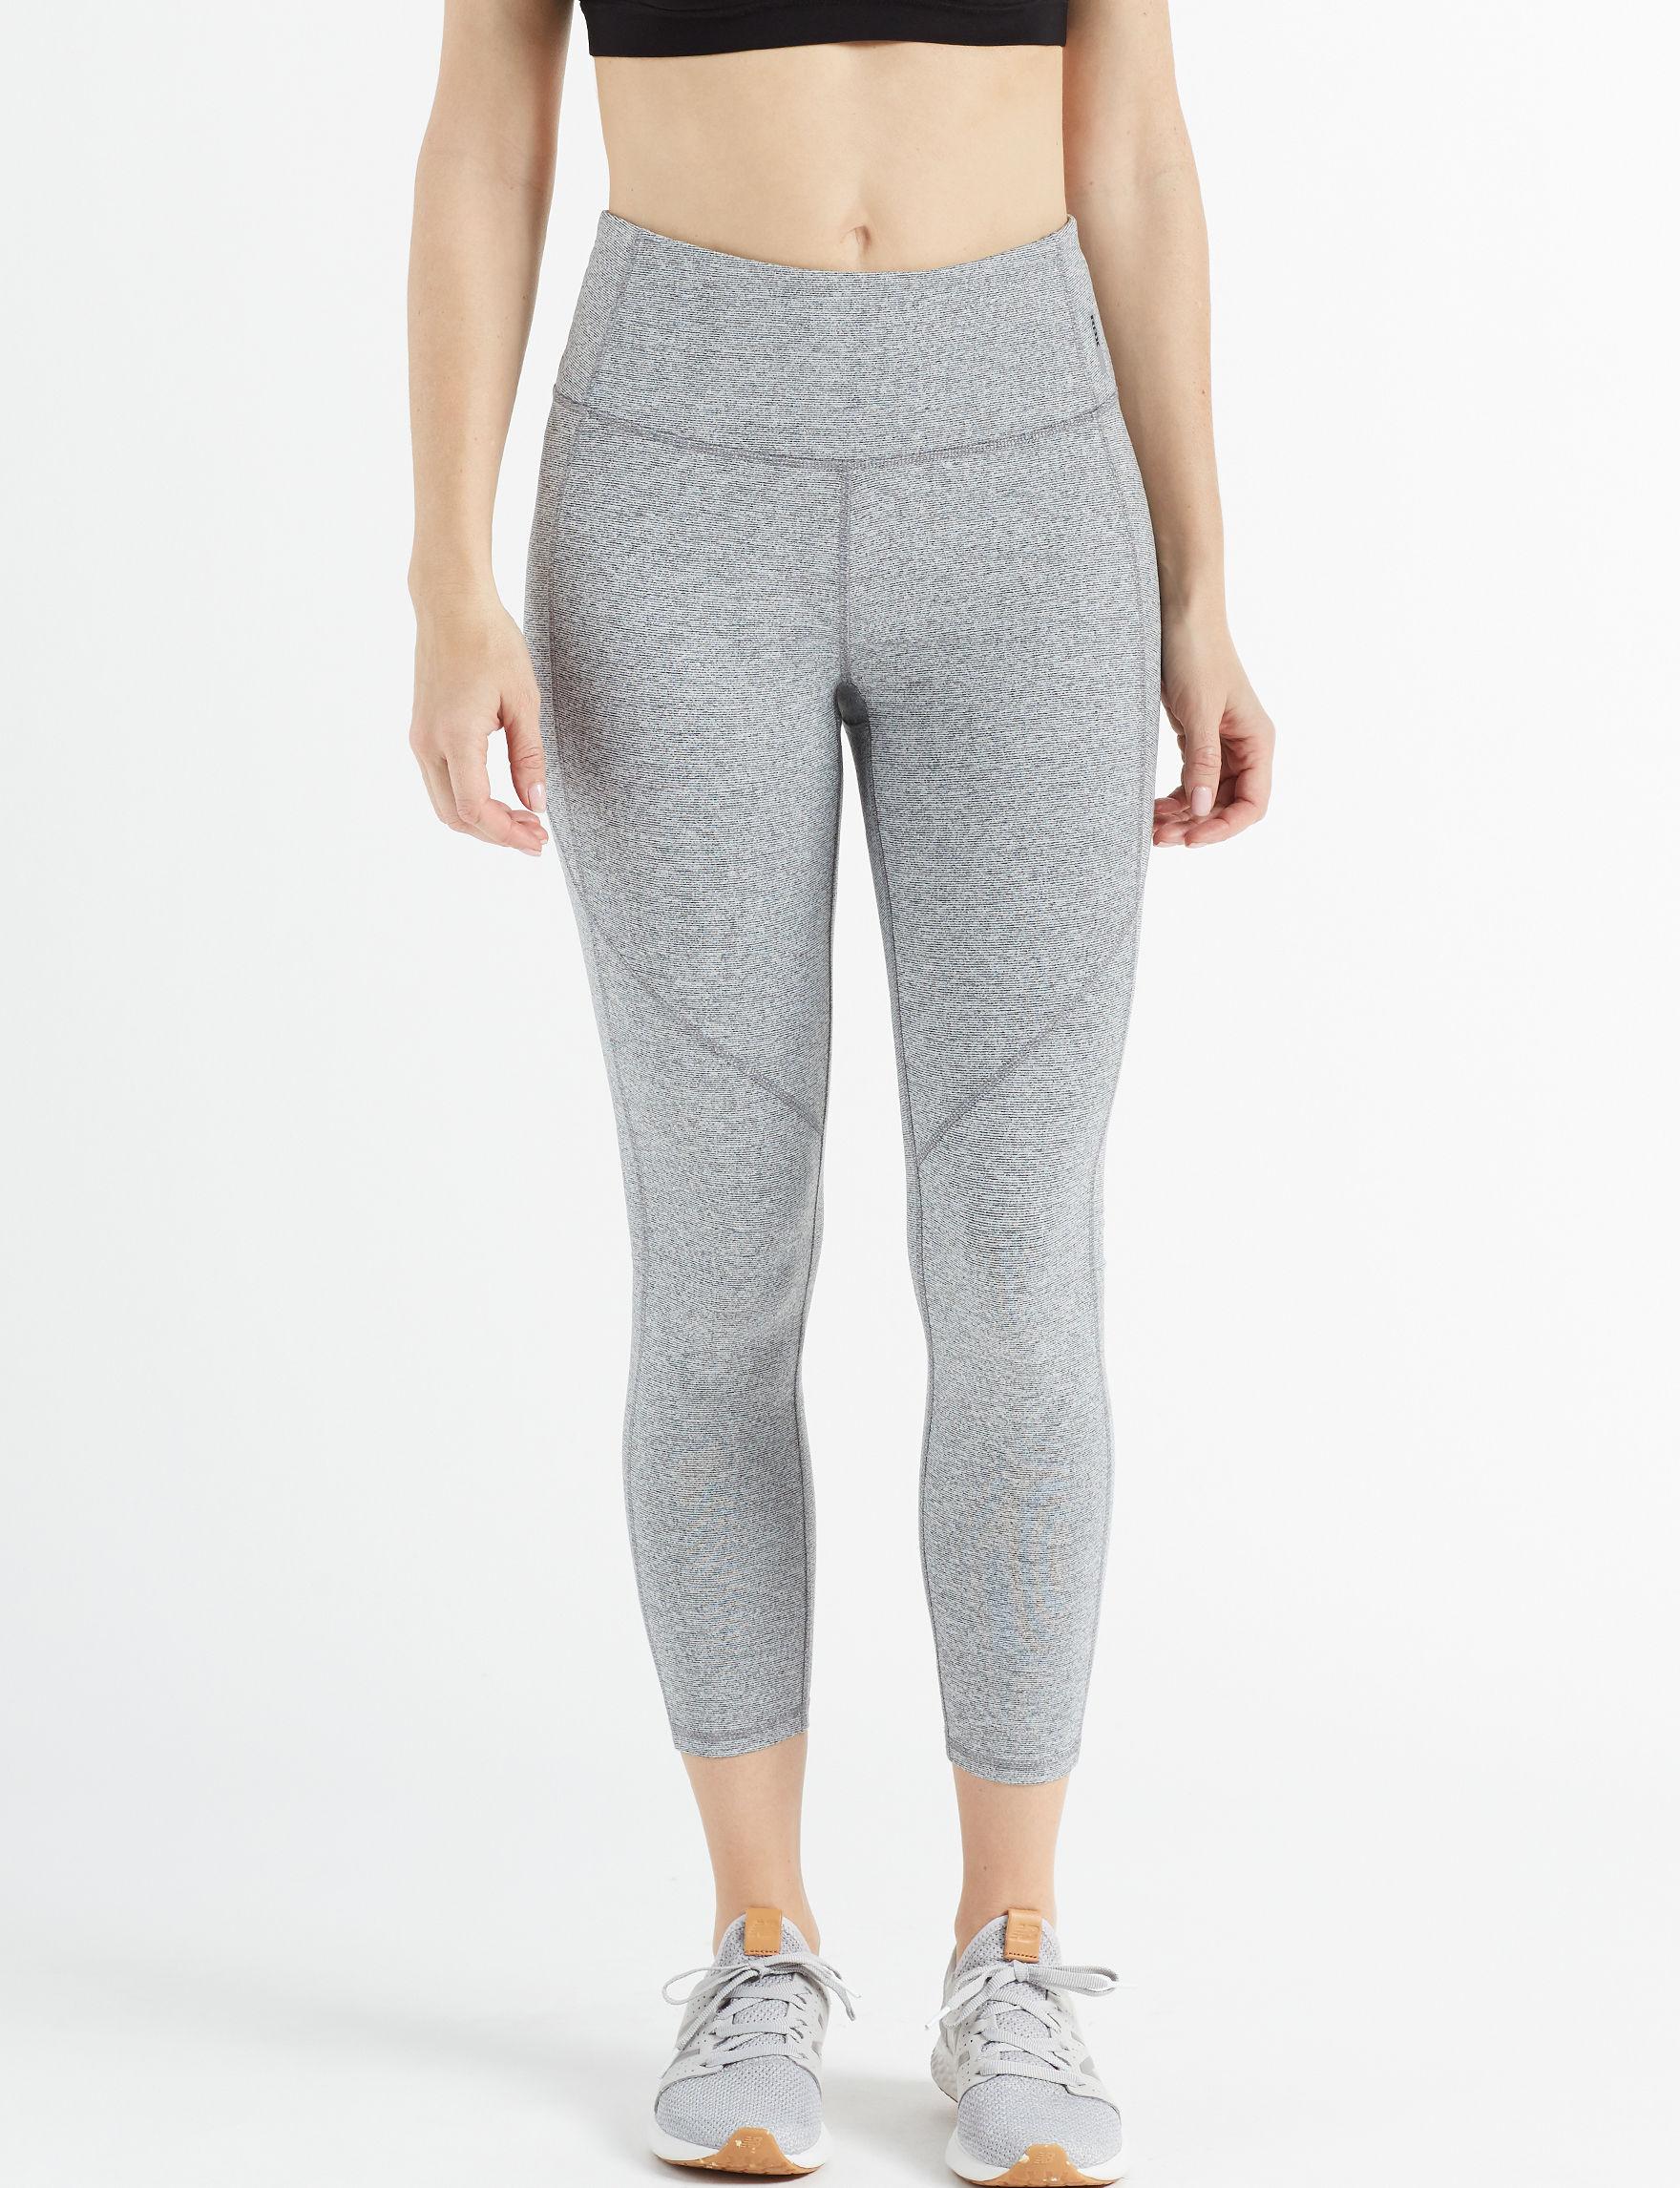 RBX Grey Active Leggings